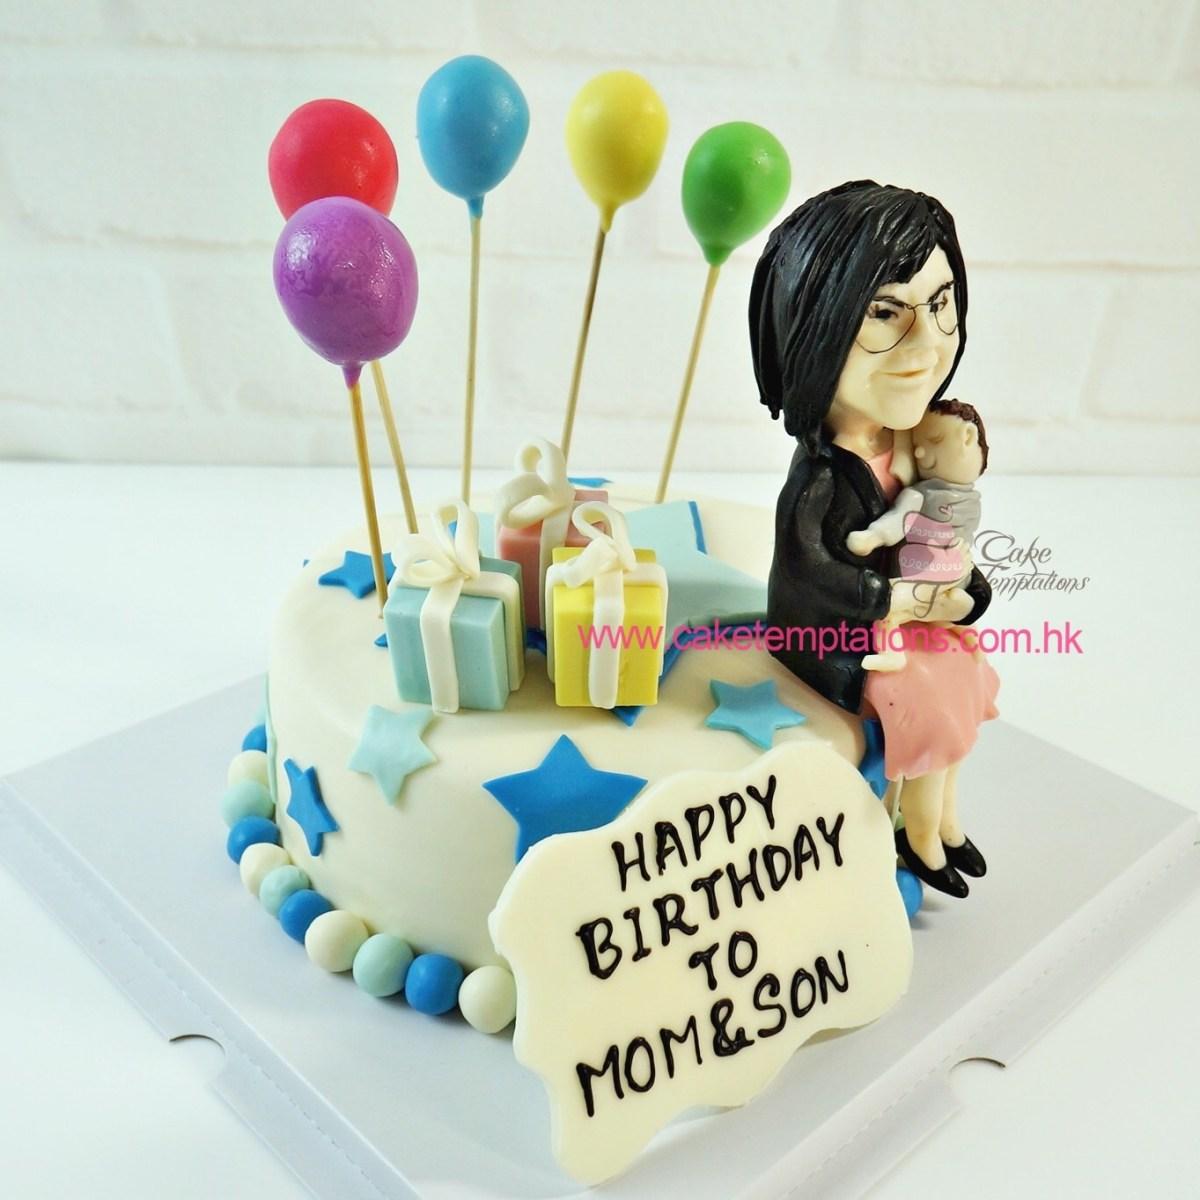 Cool Birthday Cake For Mom Mom Son Happy Birthday Cake Family Elderly Funny Birthday Cards Online Alyptdamsfinfo